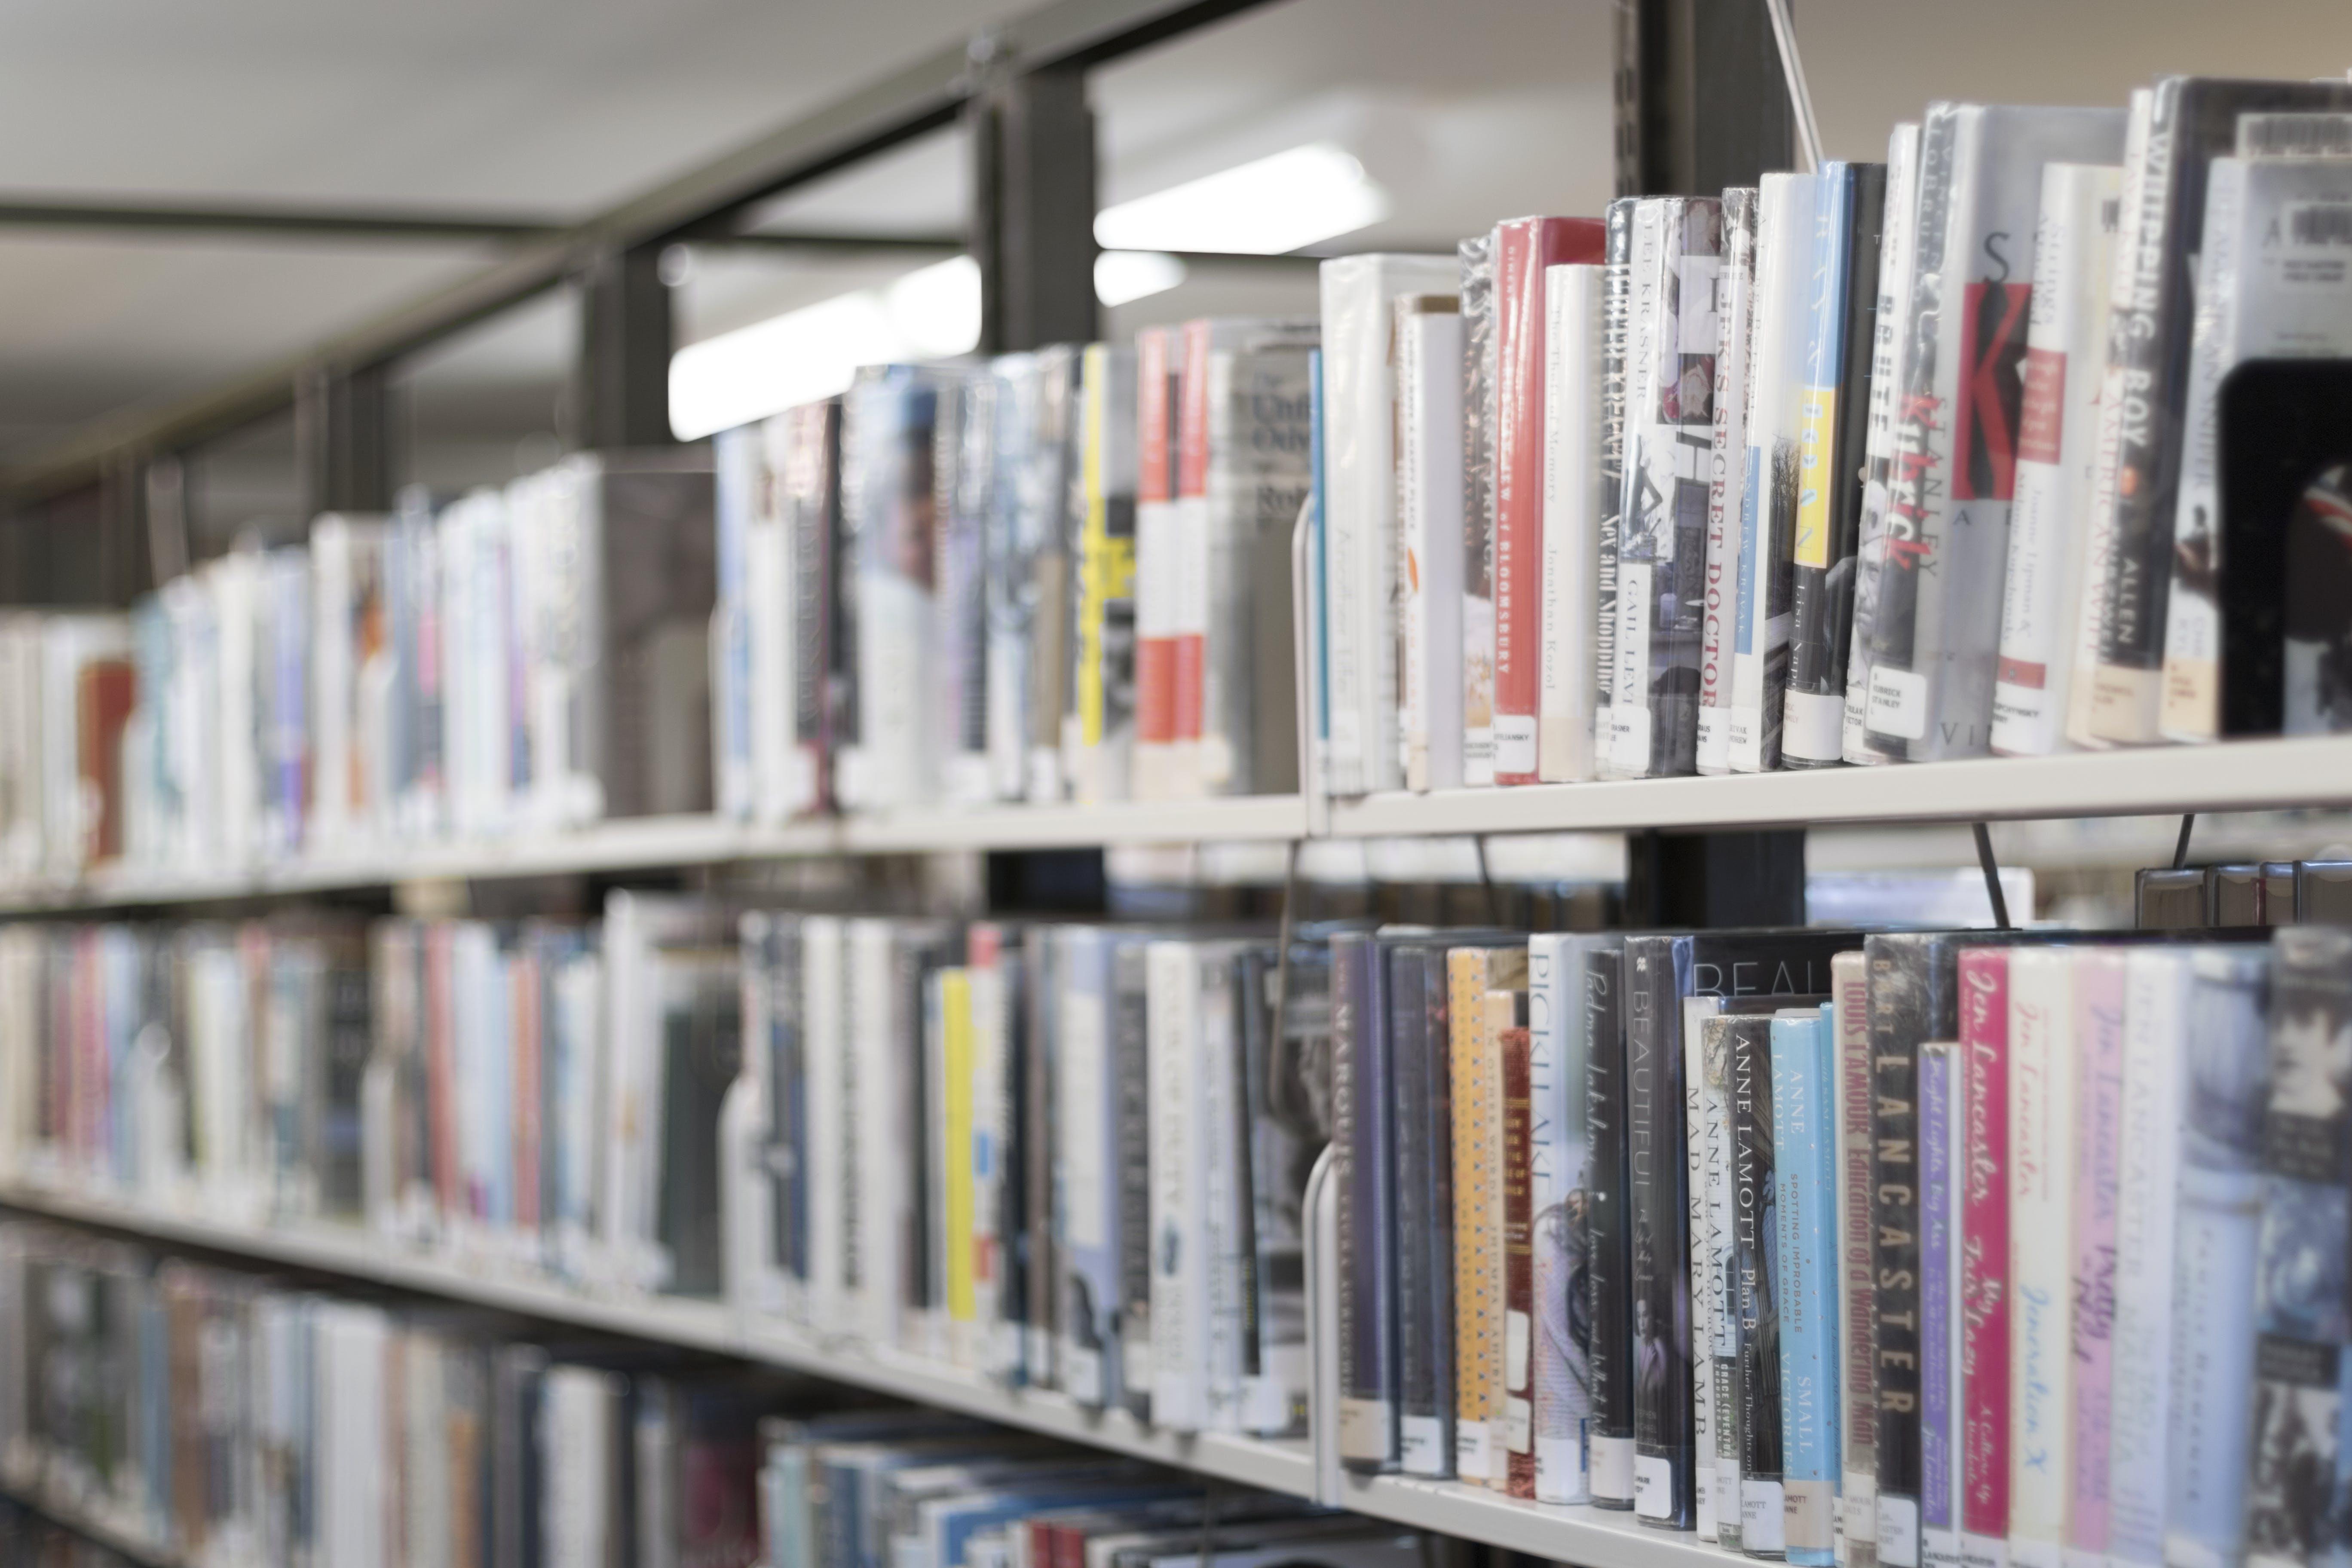 Shallow Focus Photography Of Books On Bookshelves